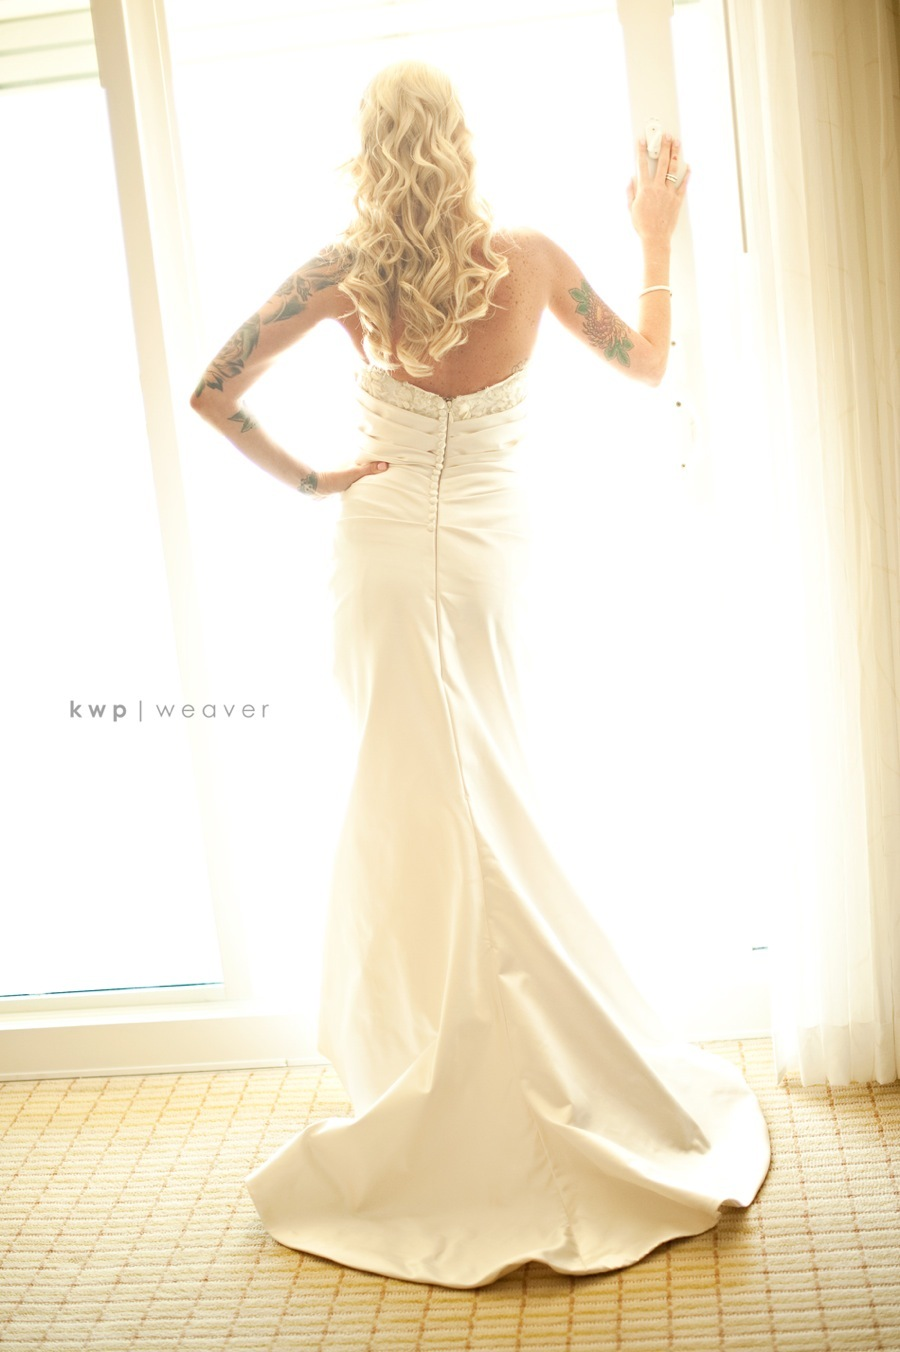 bride wears ivory mermaid wedding dress, all-down wedding hairstyle